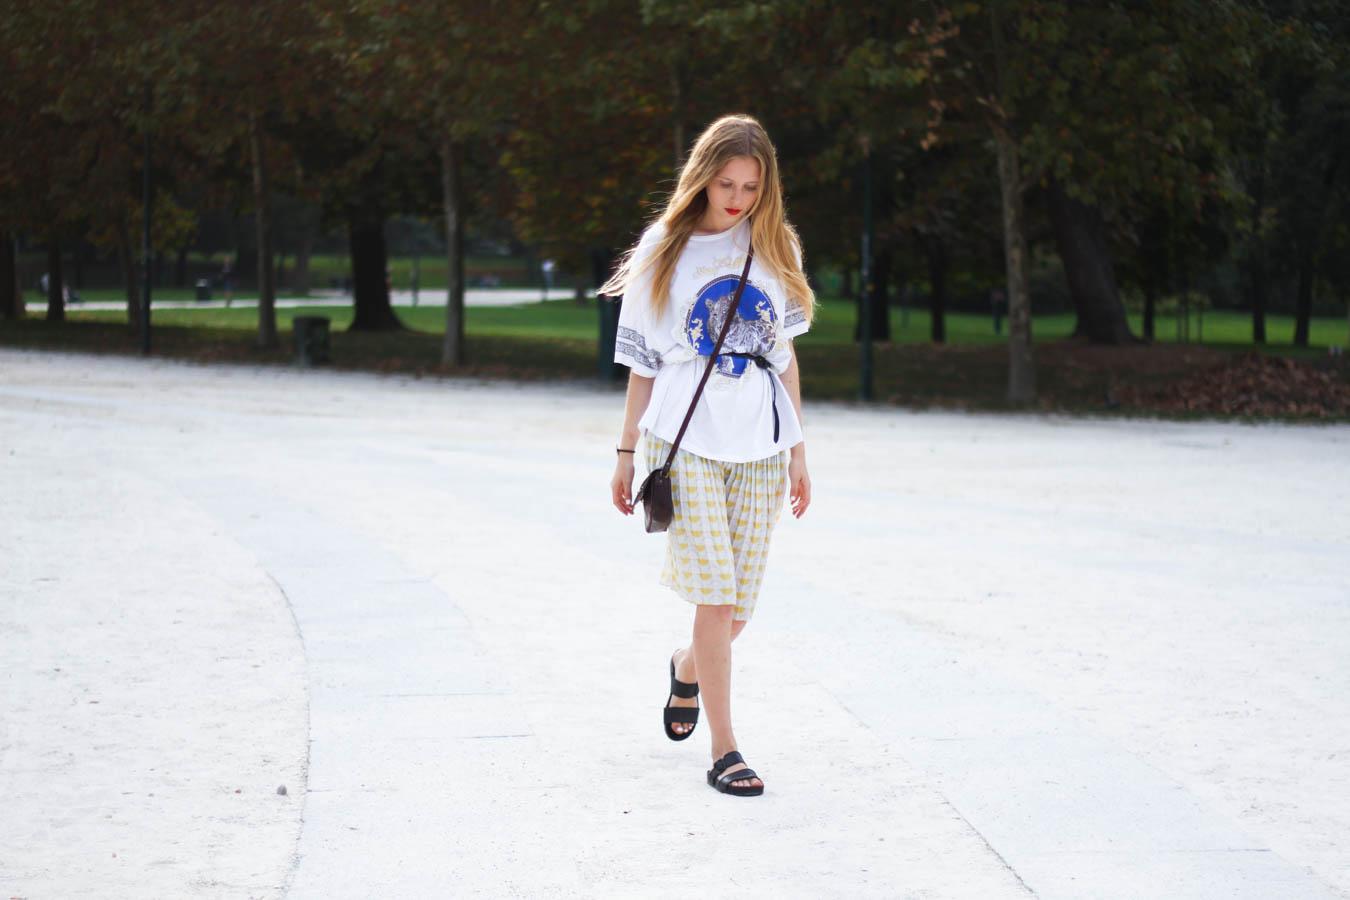 outfit august nemesis babe Milano i parken-1